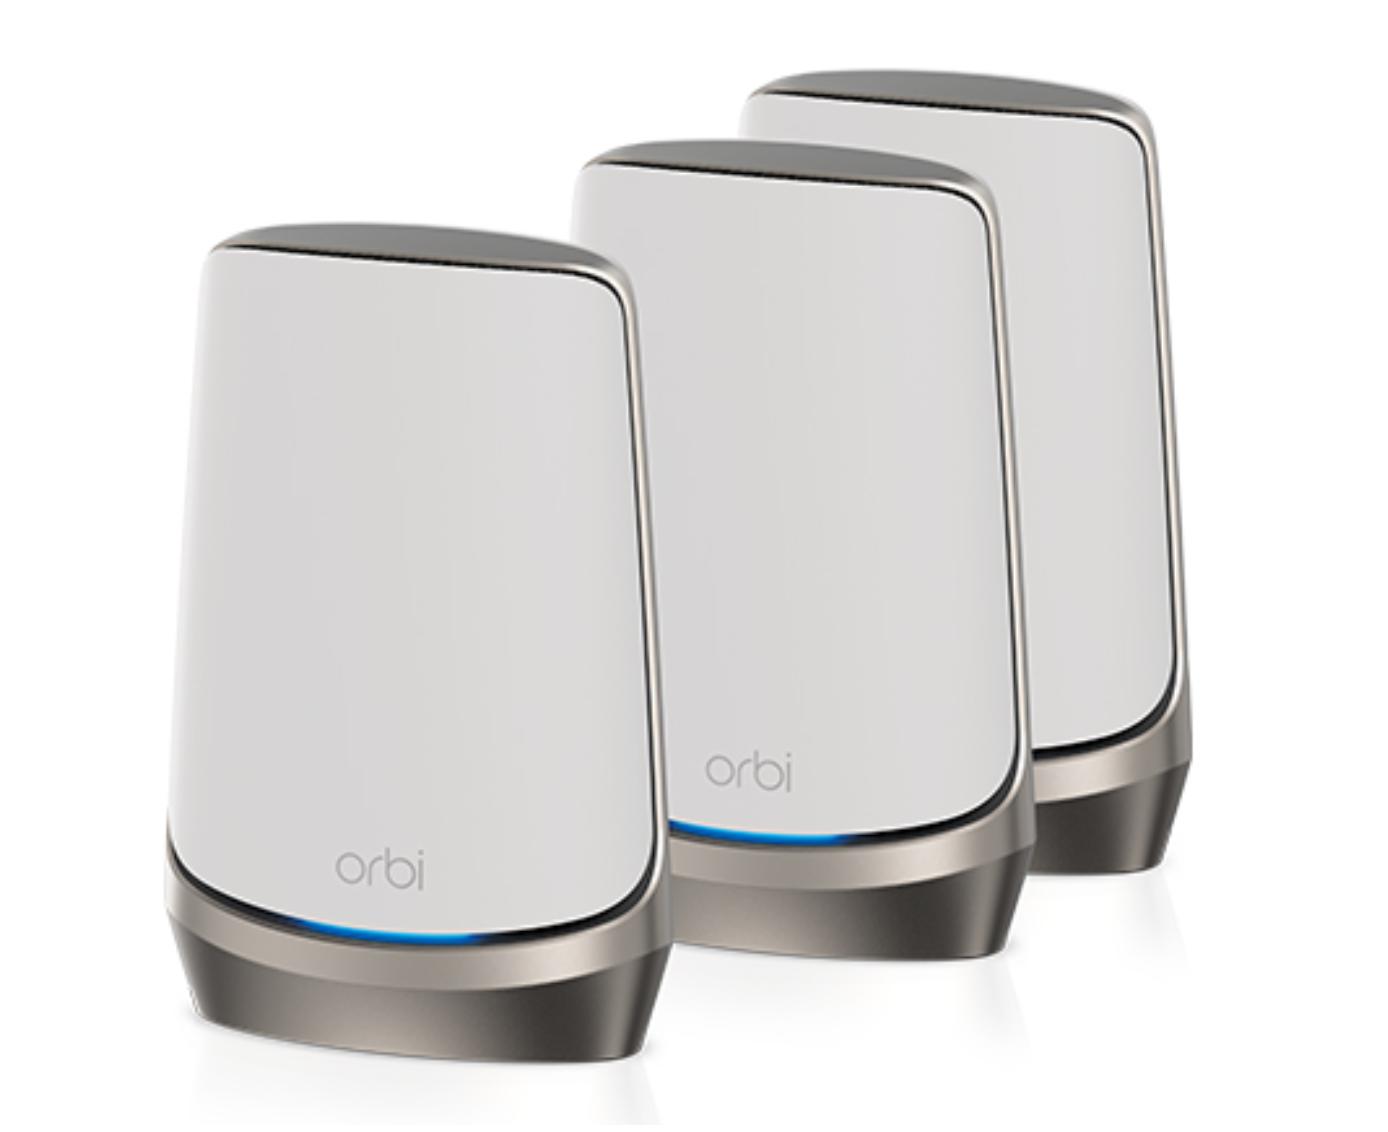 Netgear Orbi Quad-band Mesh Wi-Fi 6E